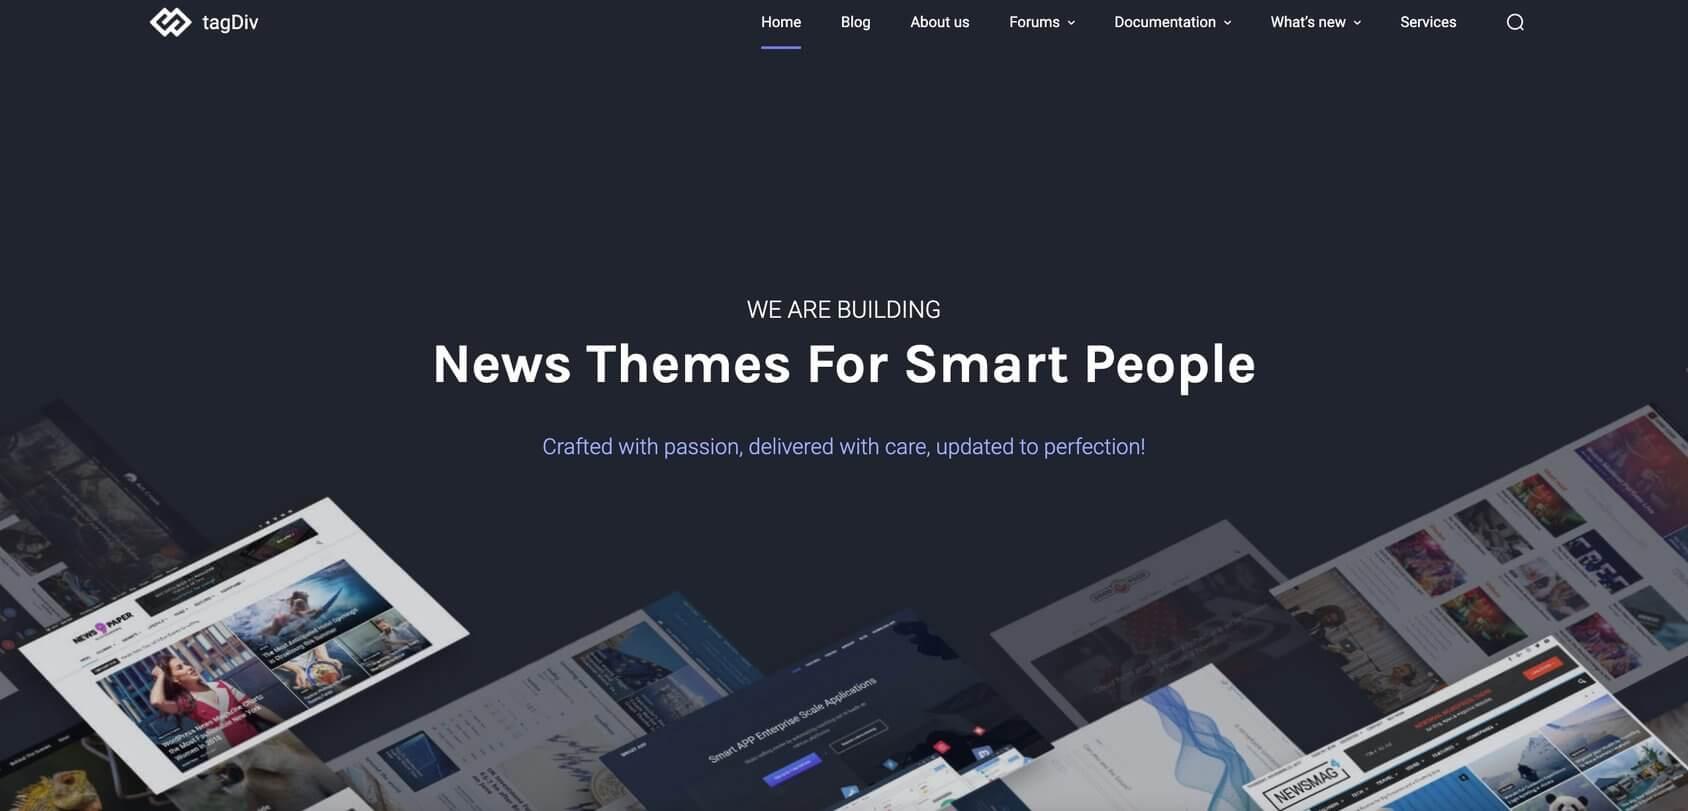 TagDiv homepage